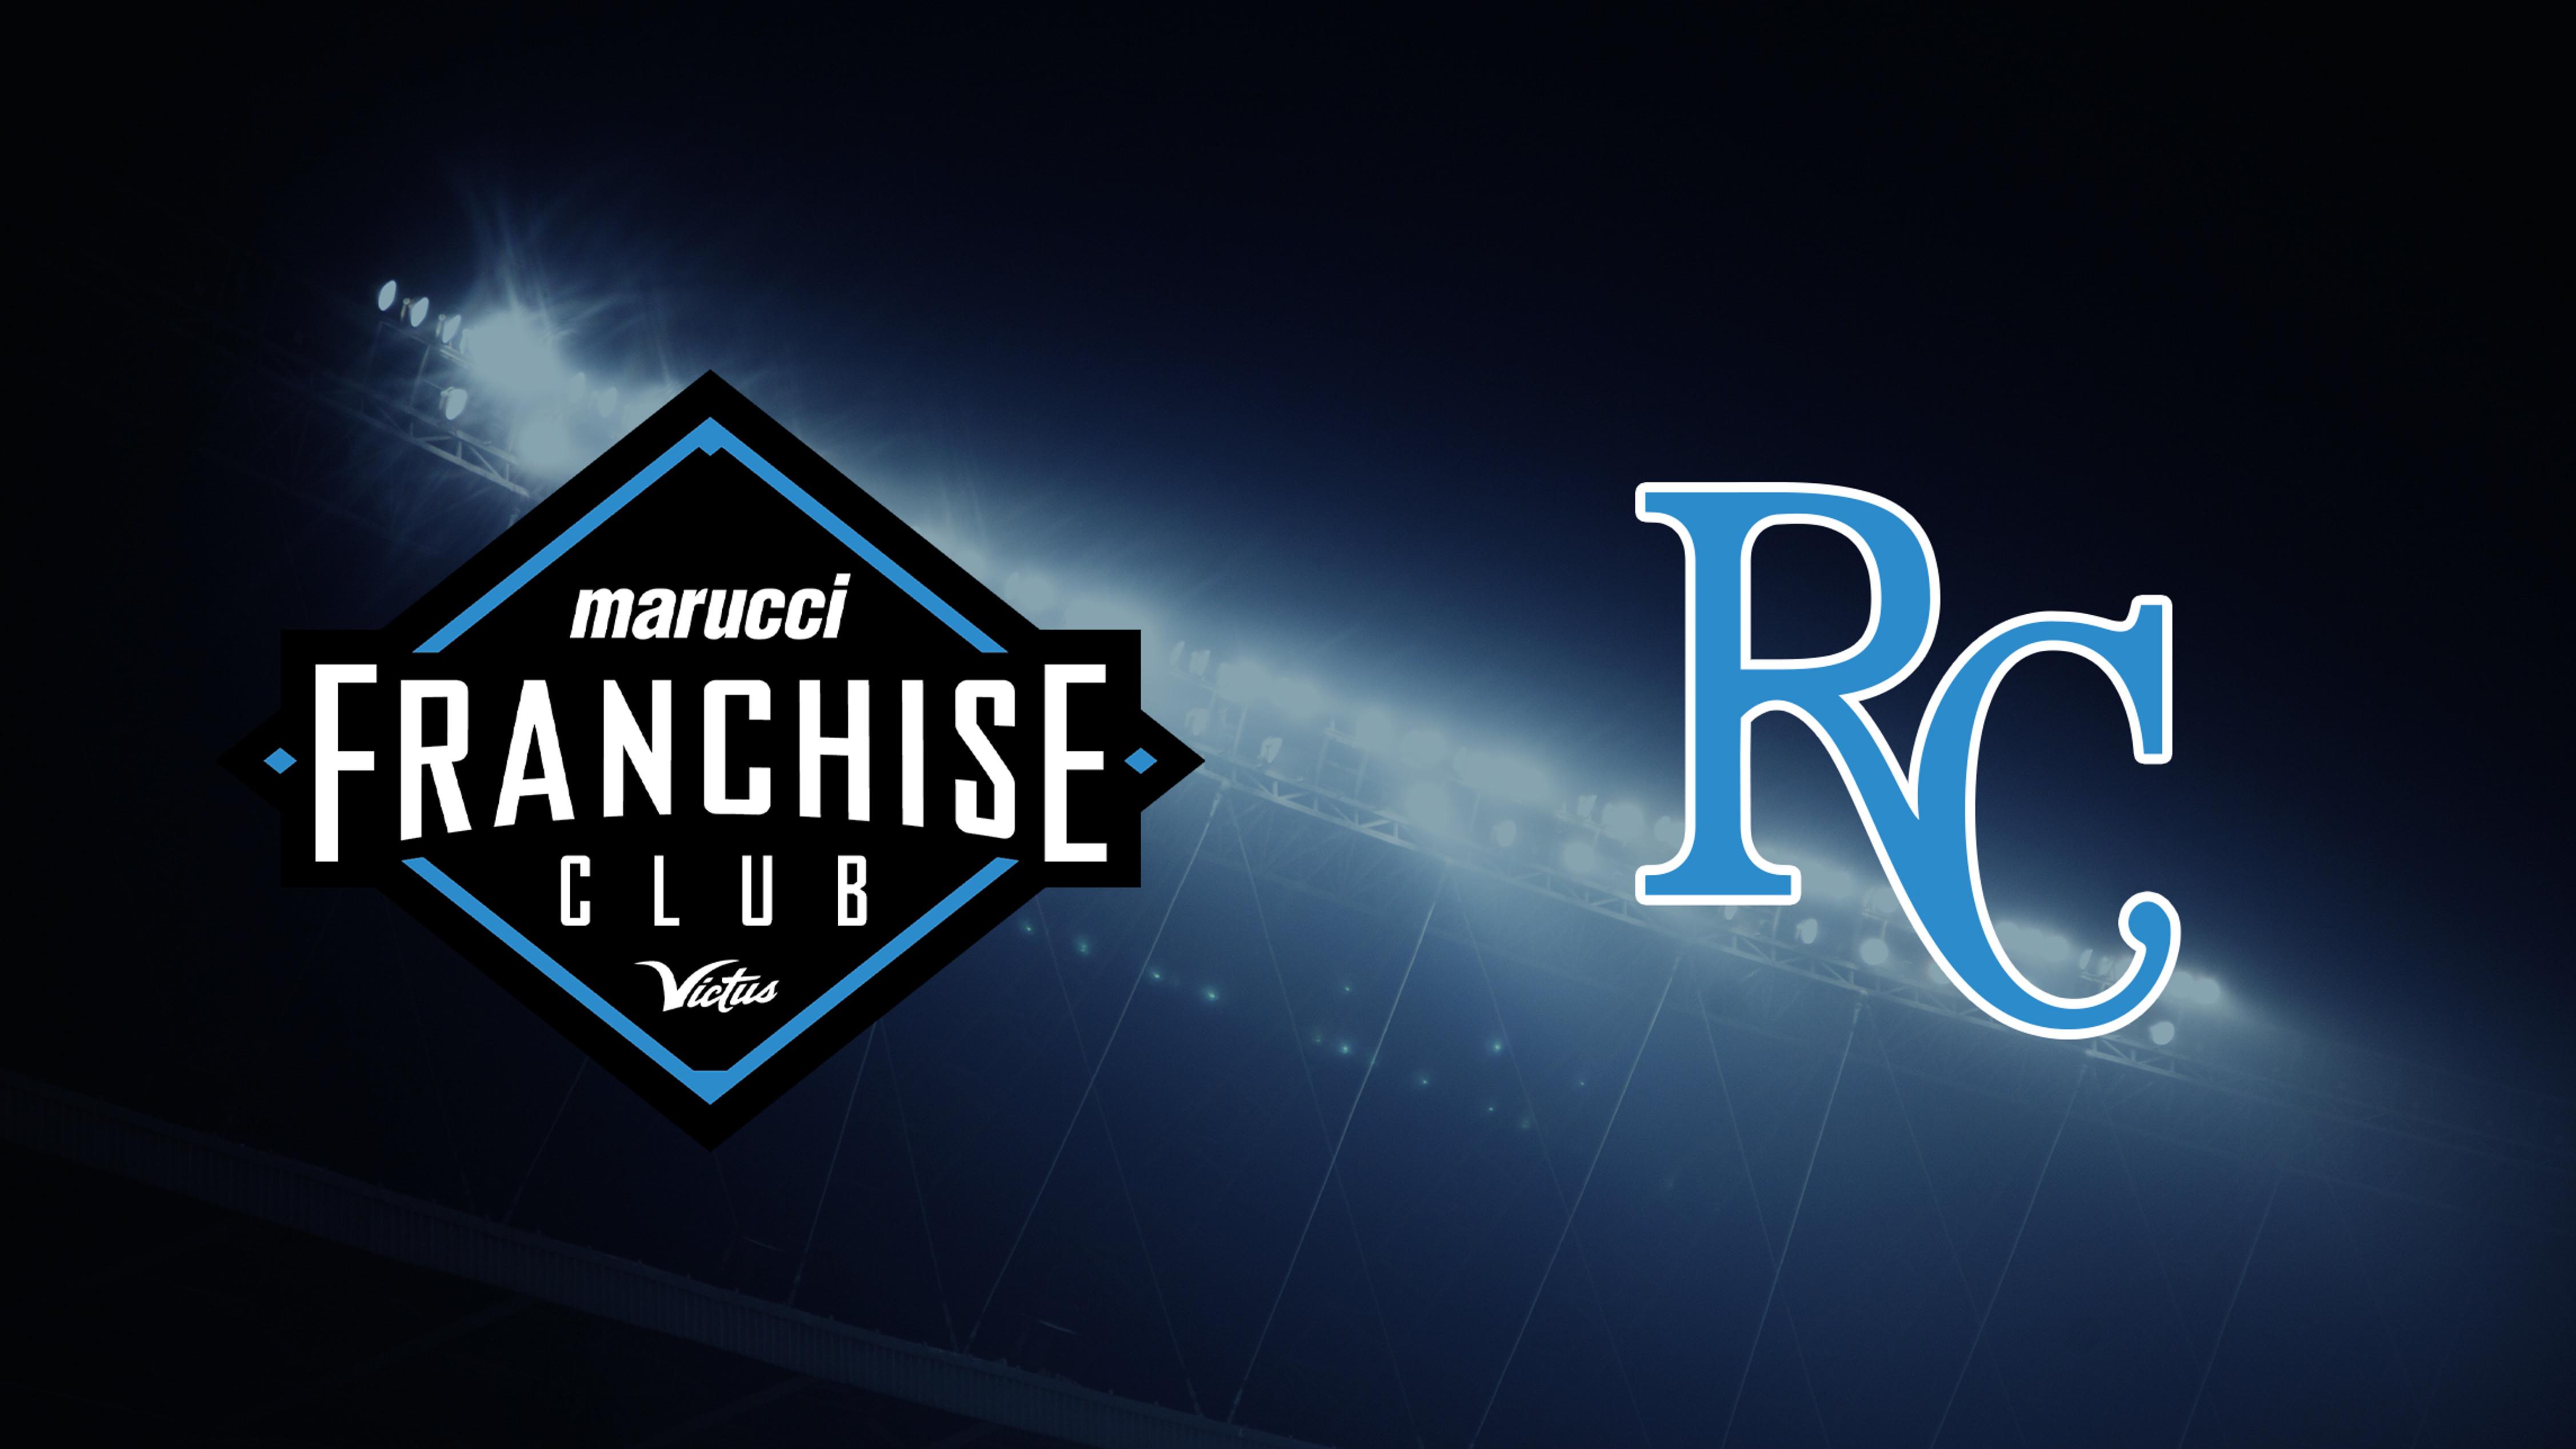 Richmond County Baseball Club Signs New Multi-Year Deal With Marucci Sports